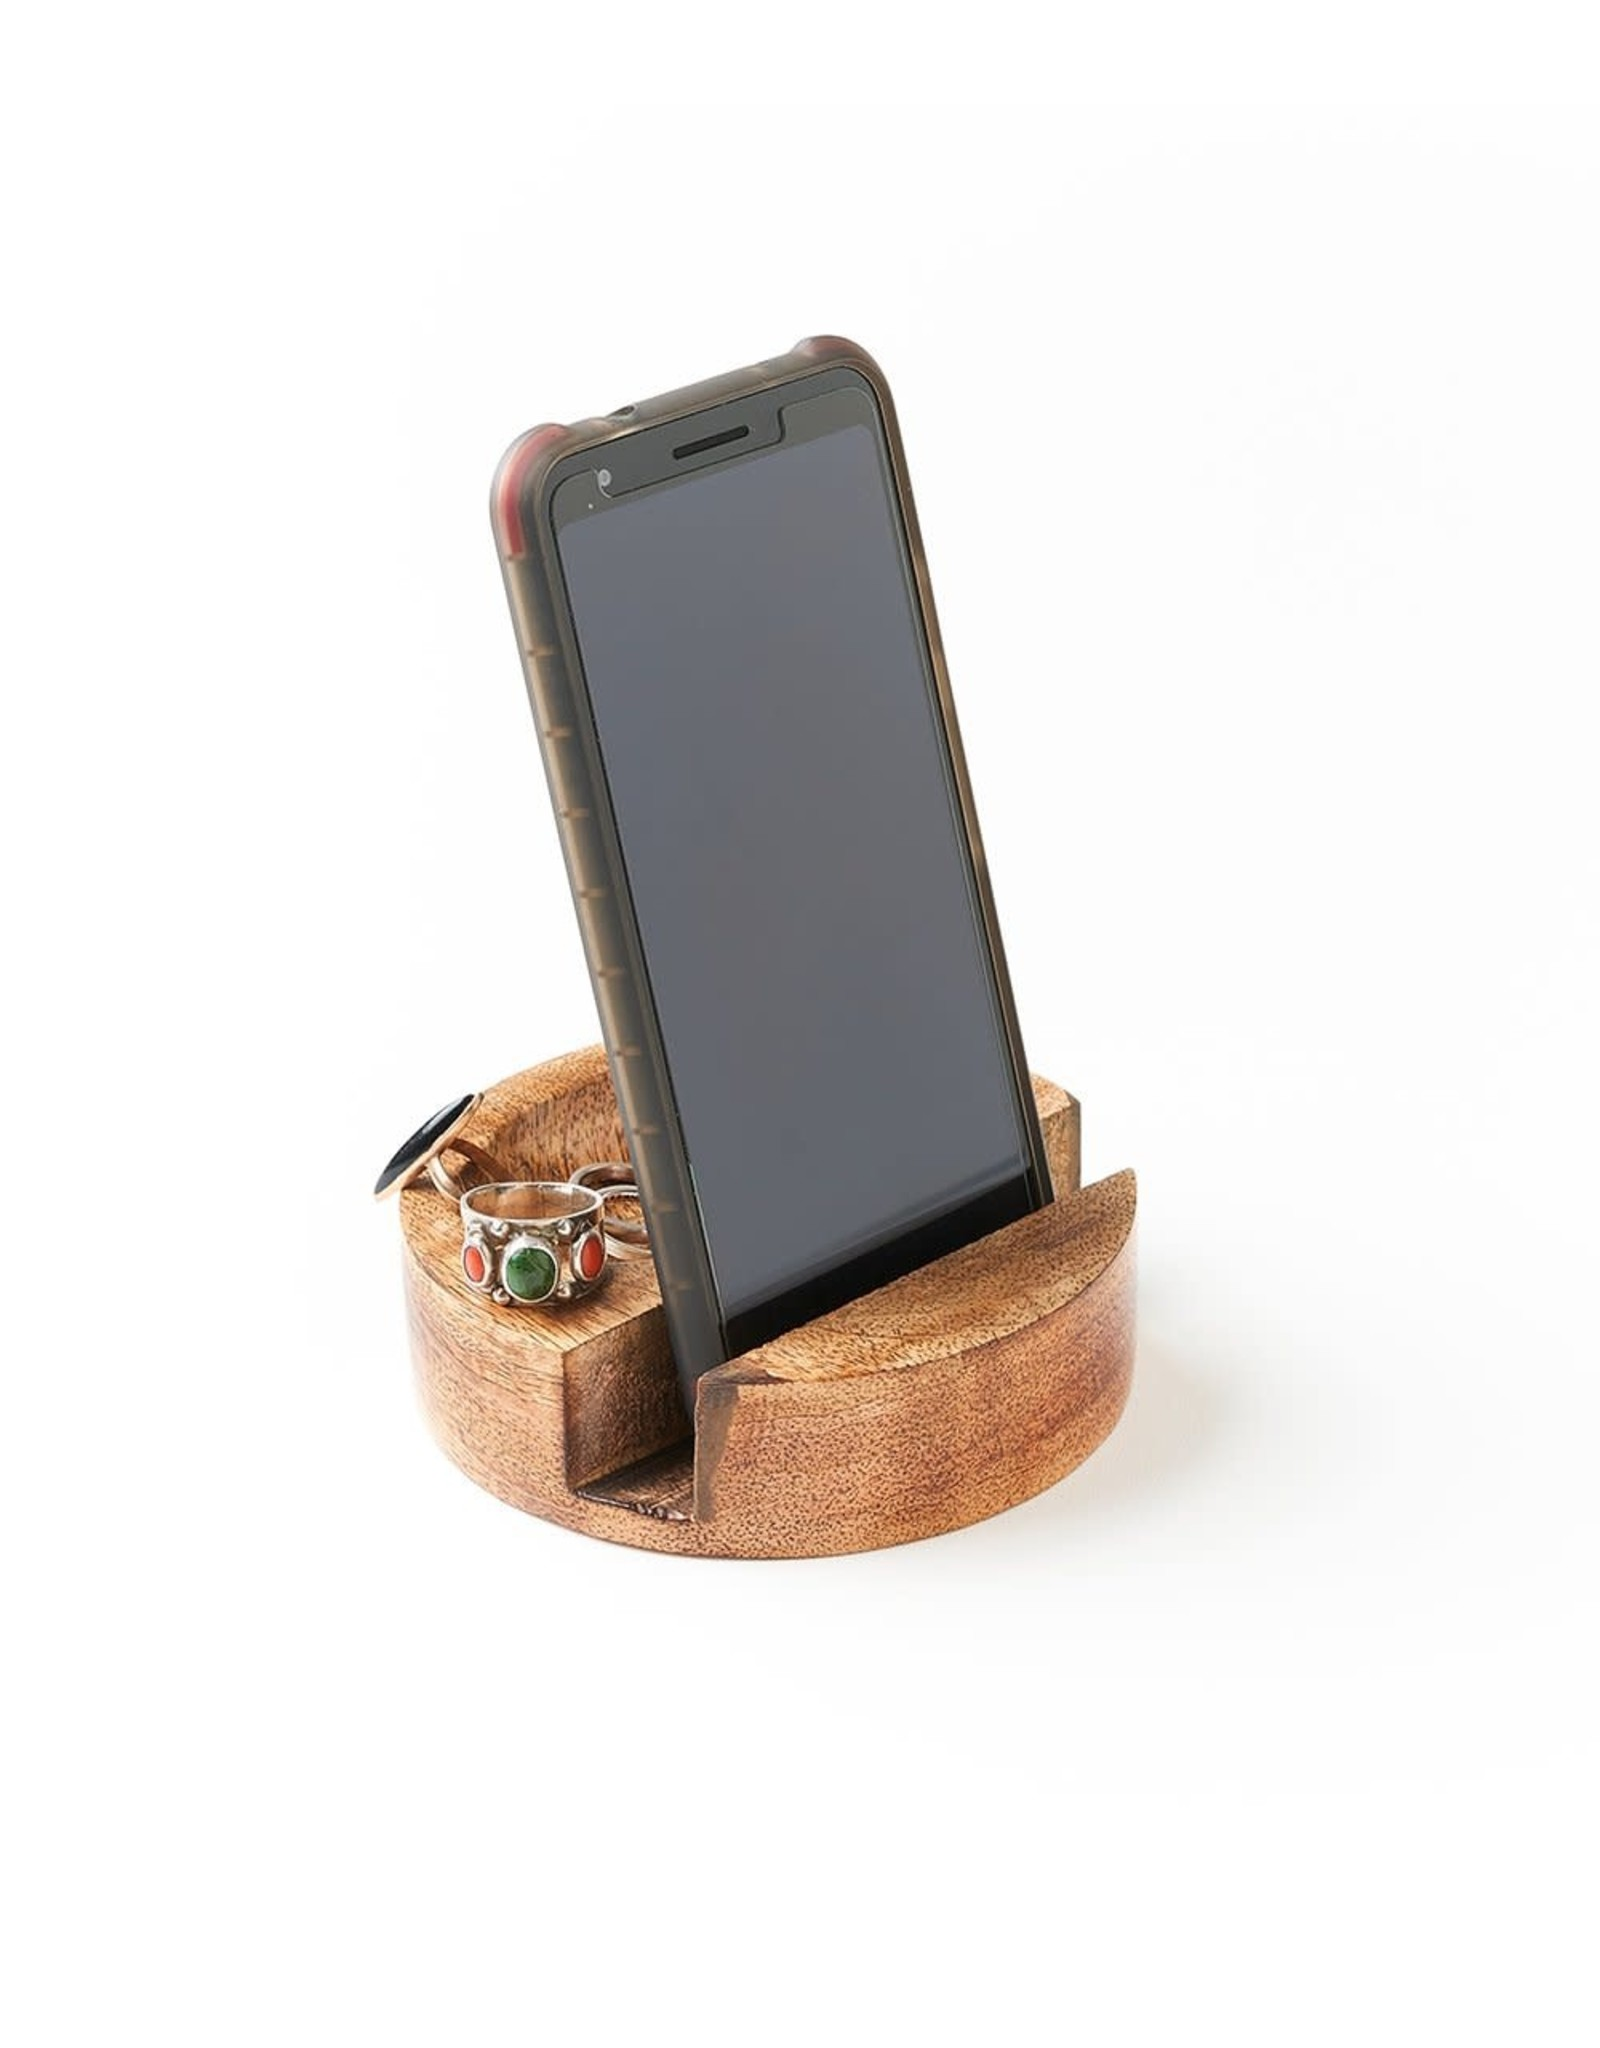 Matr Boomie Jyotisha Smartphone Dock